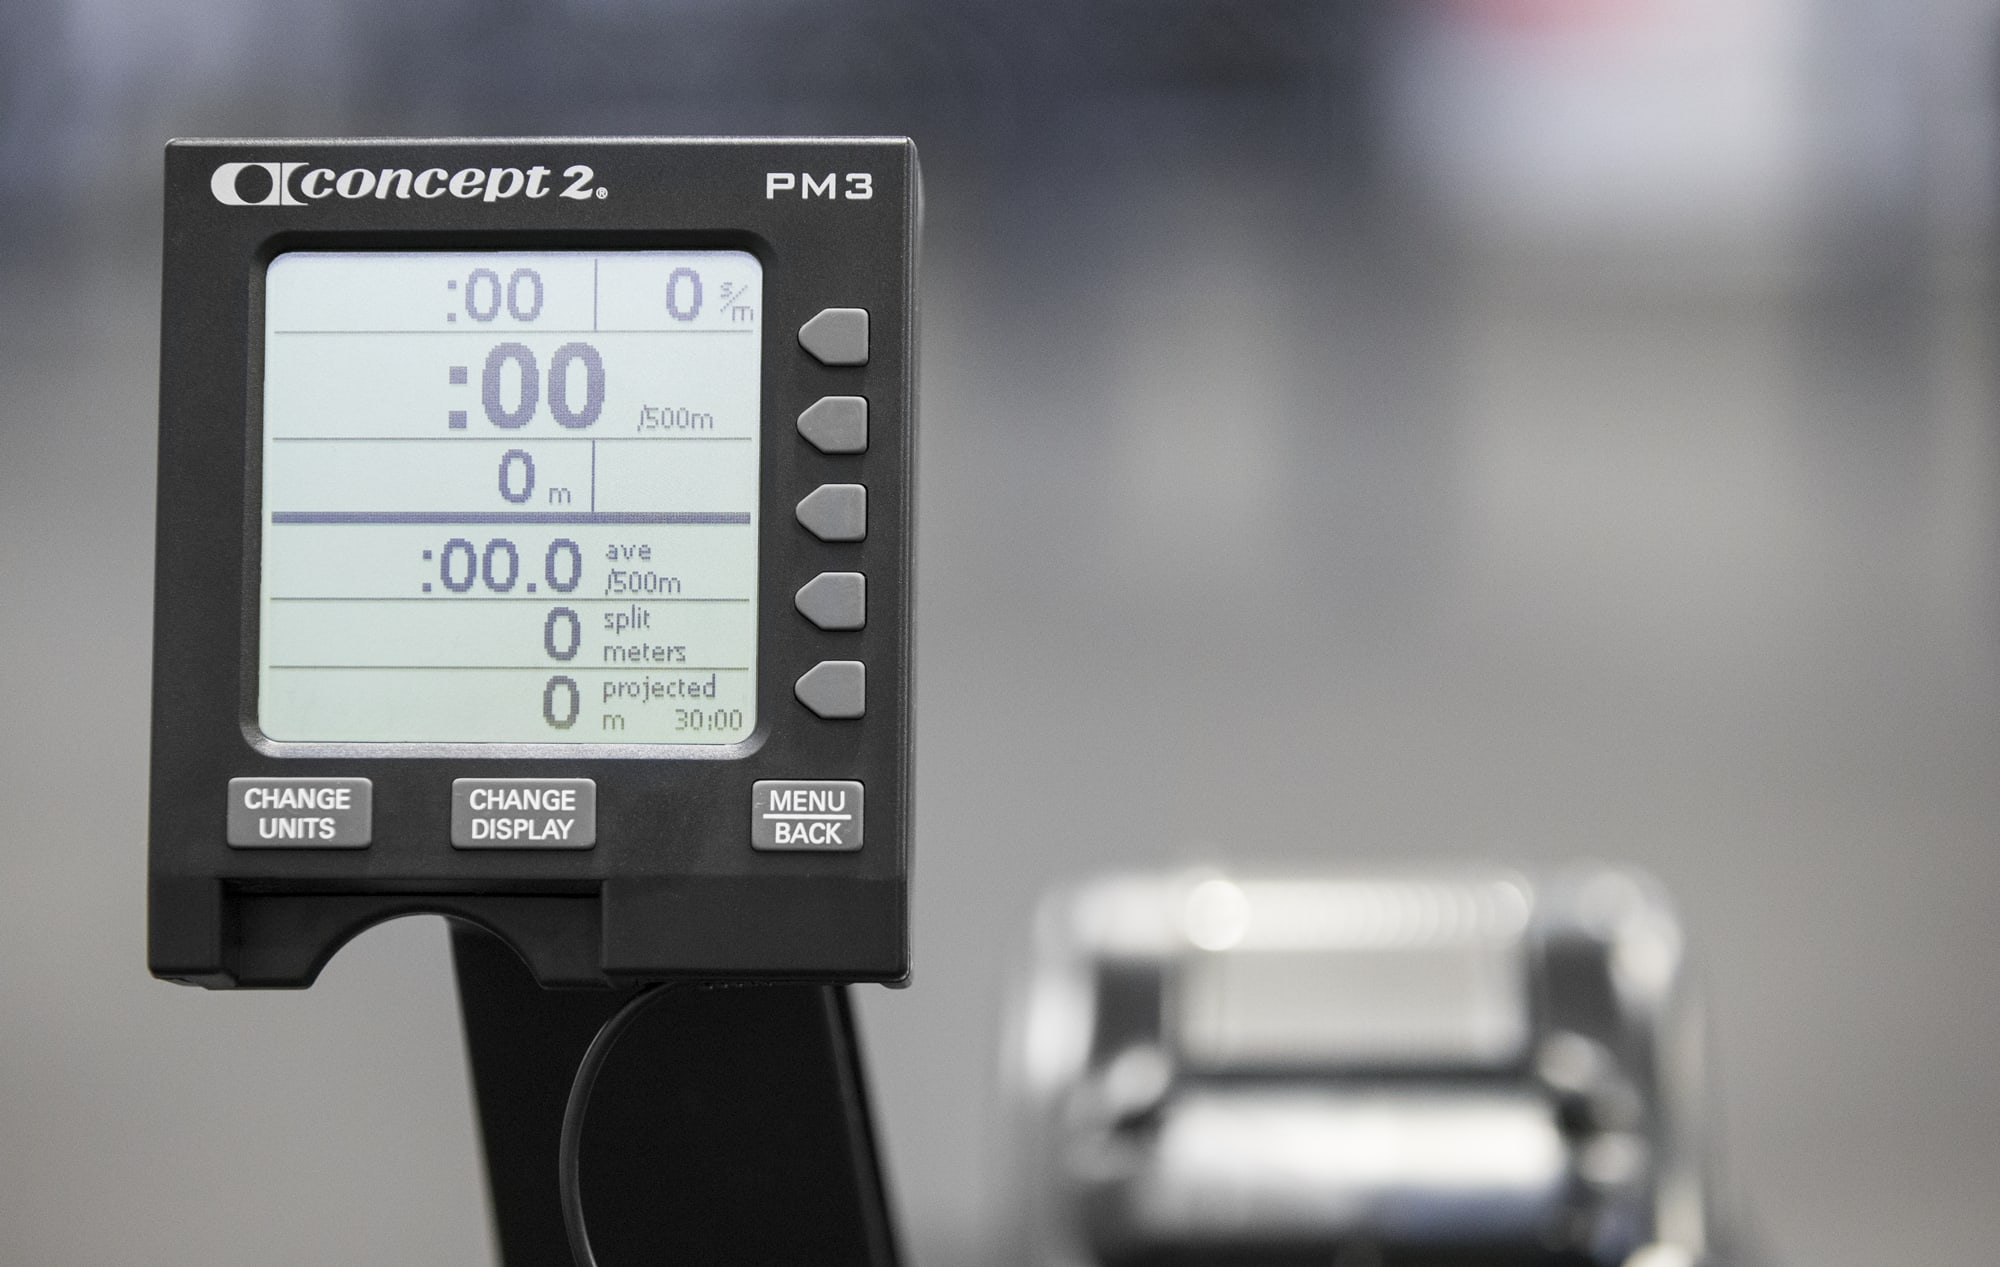 PM5 Performance Monitor